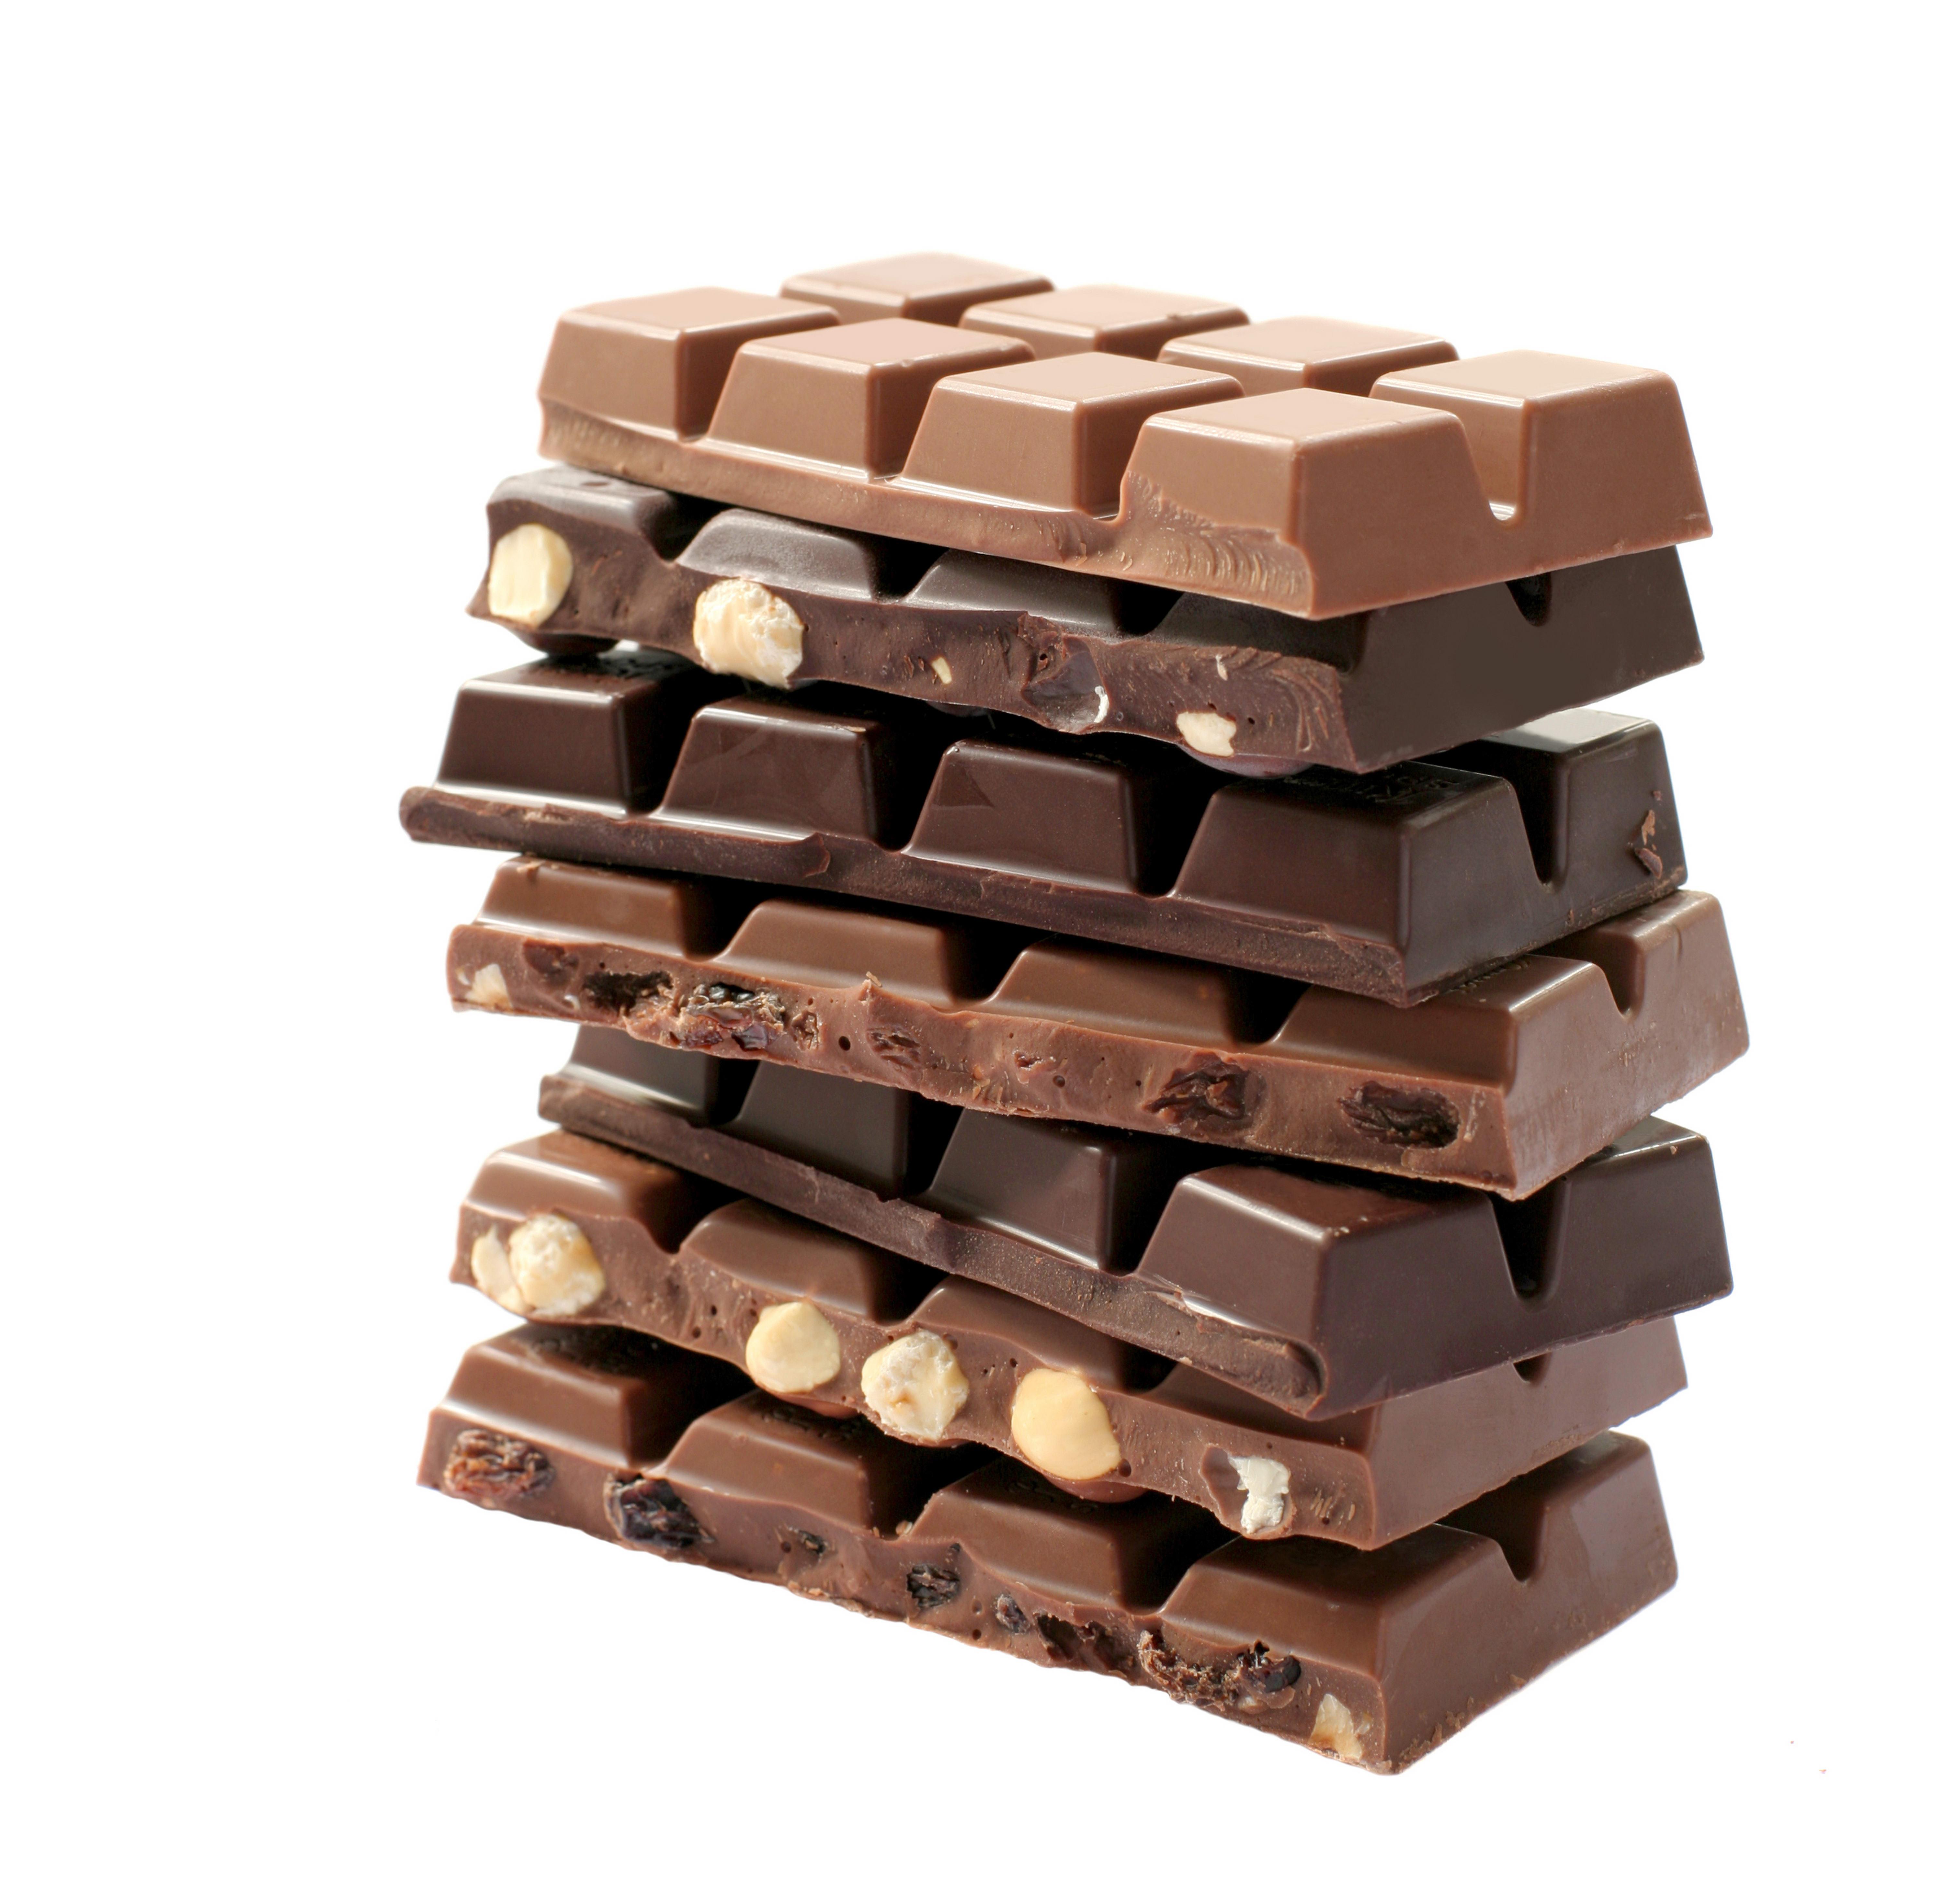 Как появился шоколад в плитках